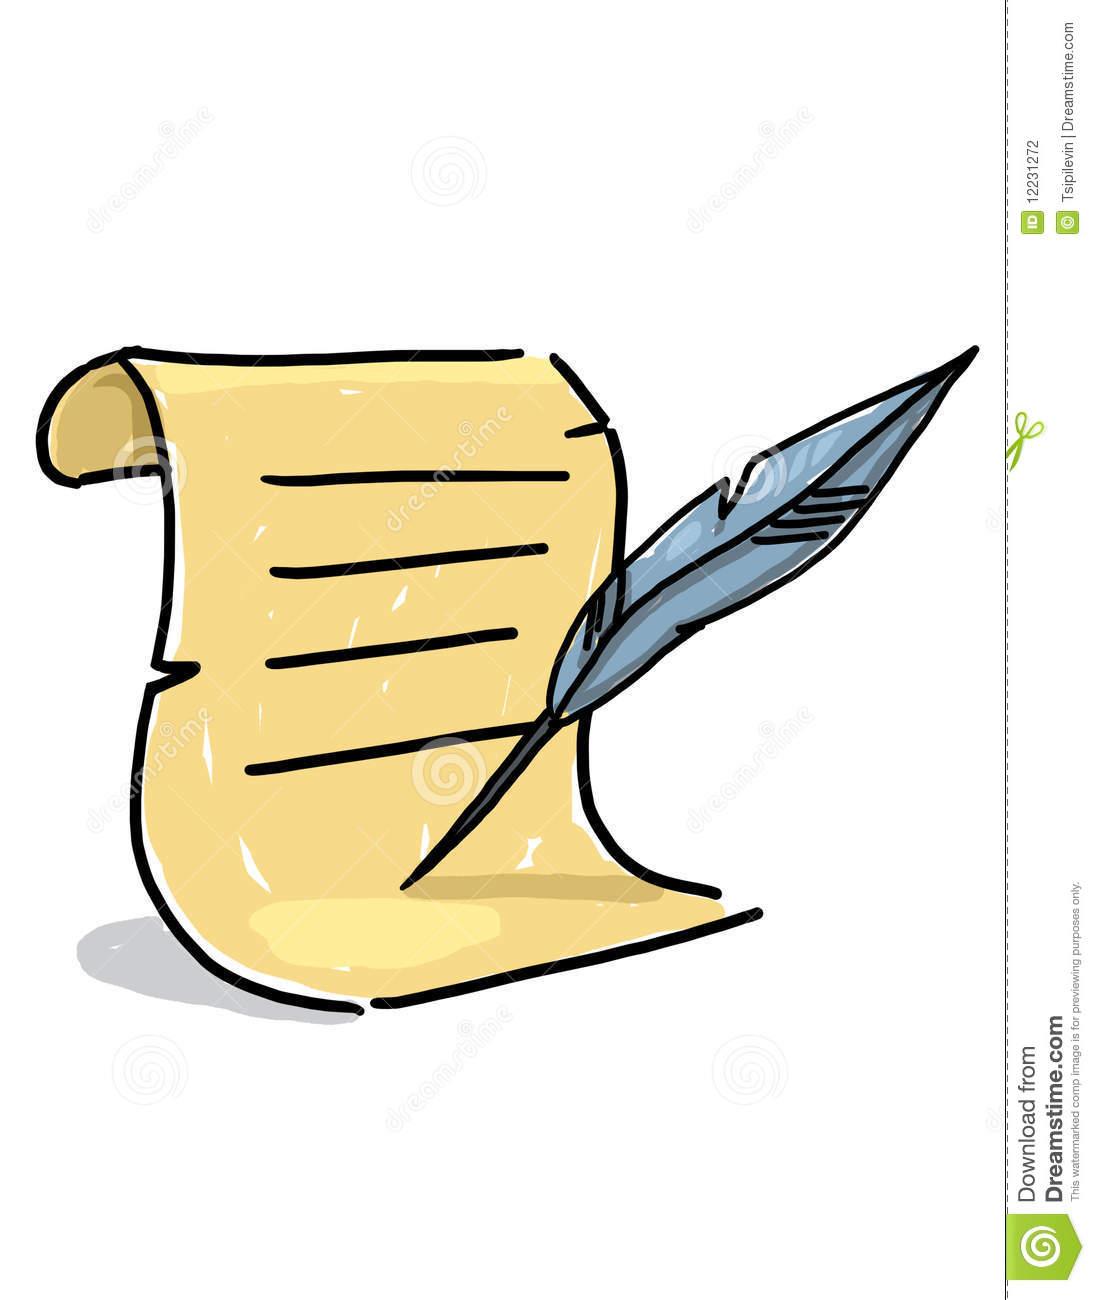 1095x1300 Poem Clipart Scroll